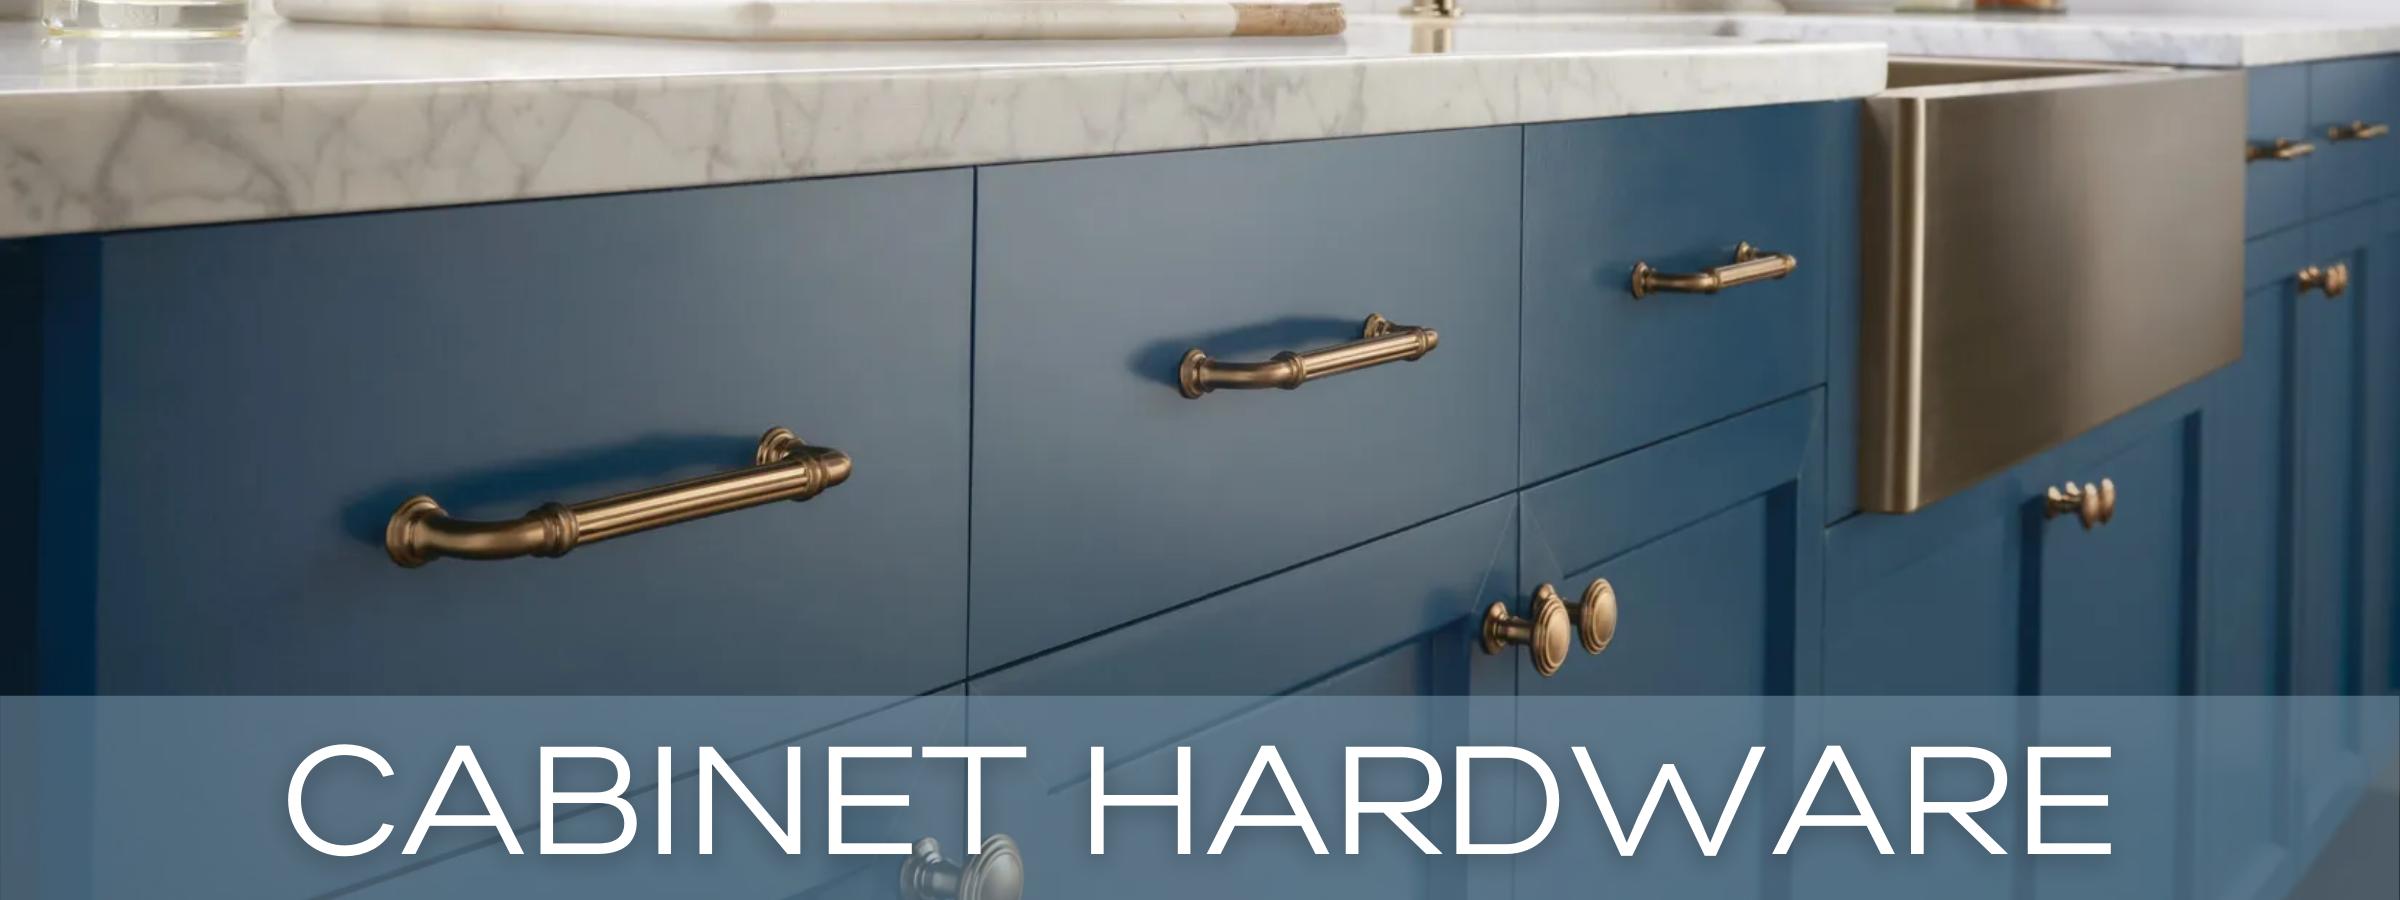 Cabinet Hardware Lg